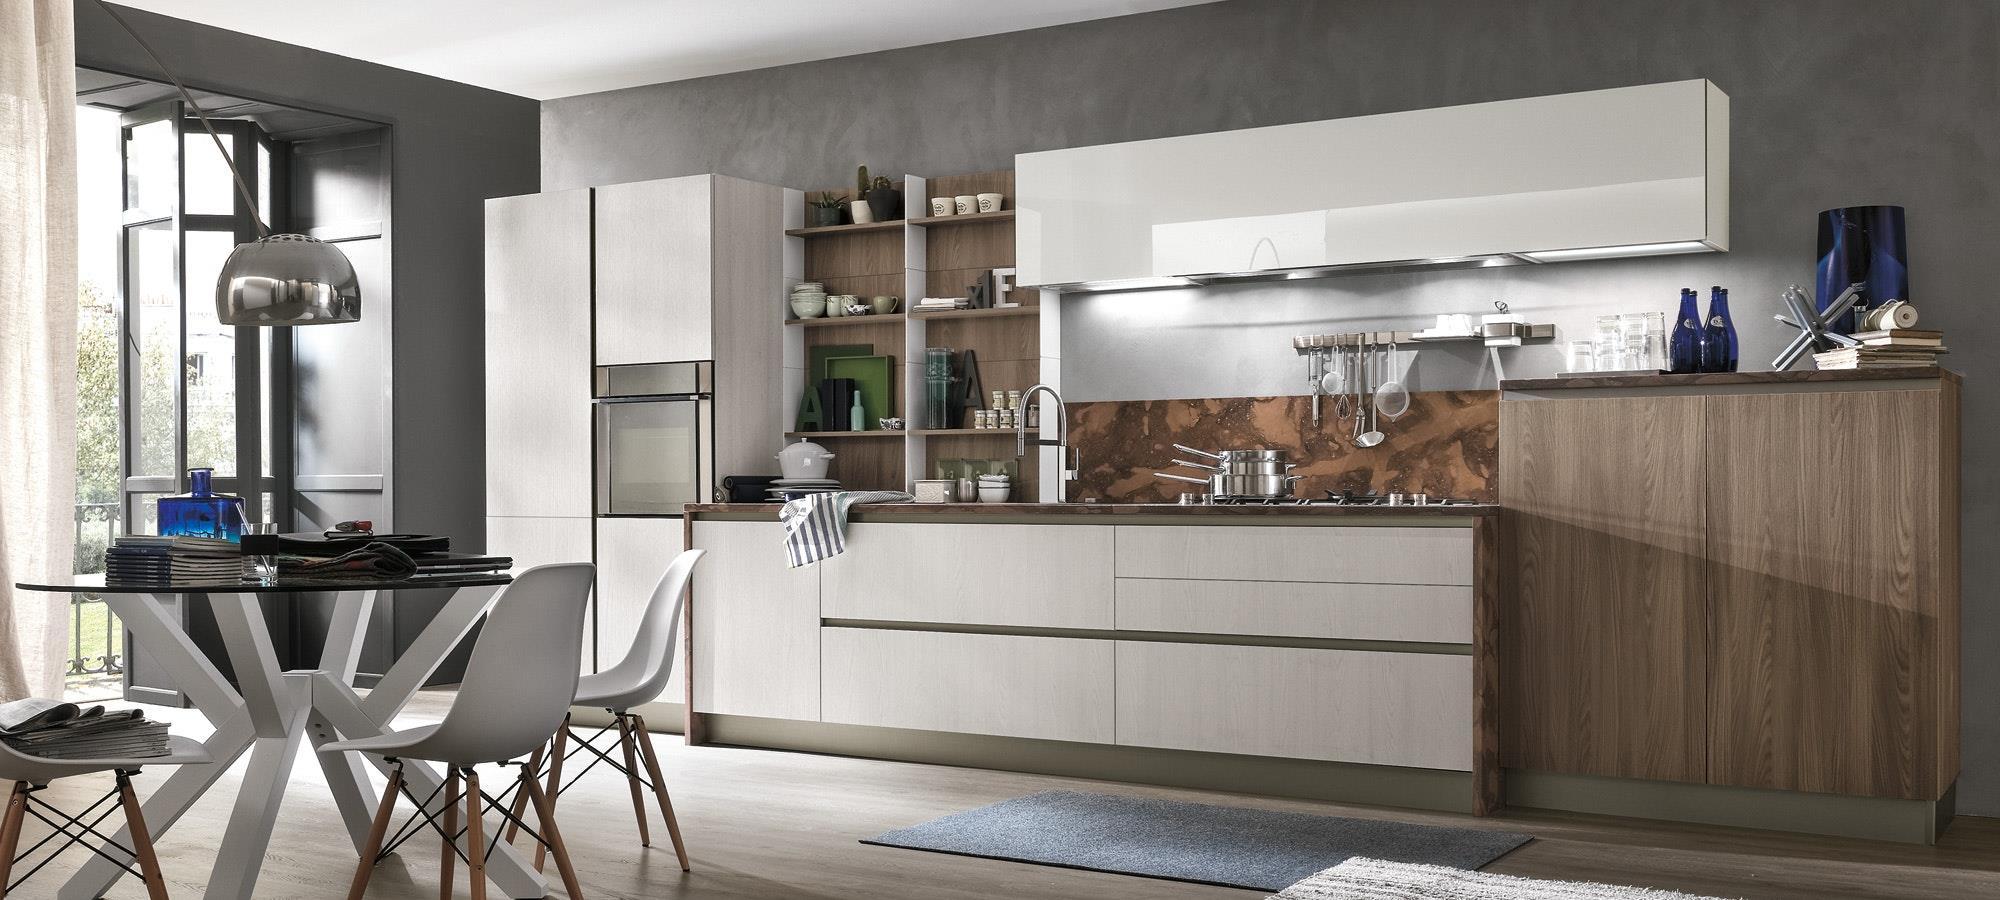 Infinity Stosa Cucina Moderna